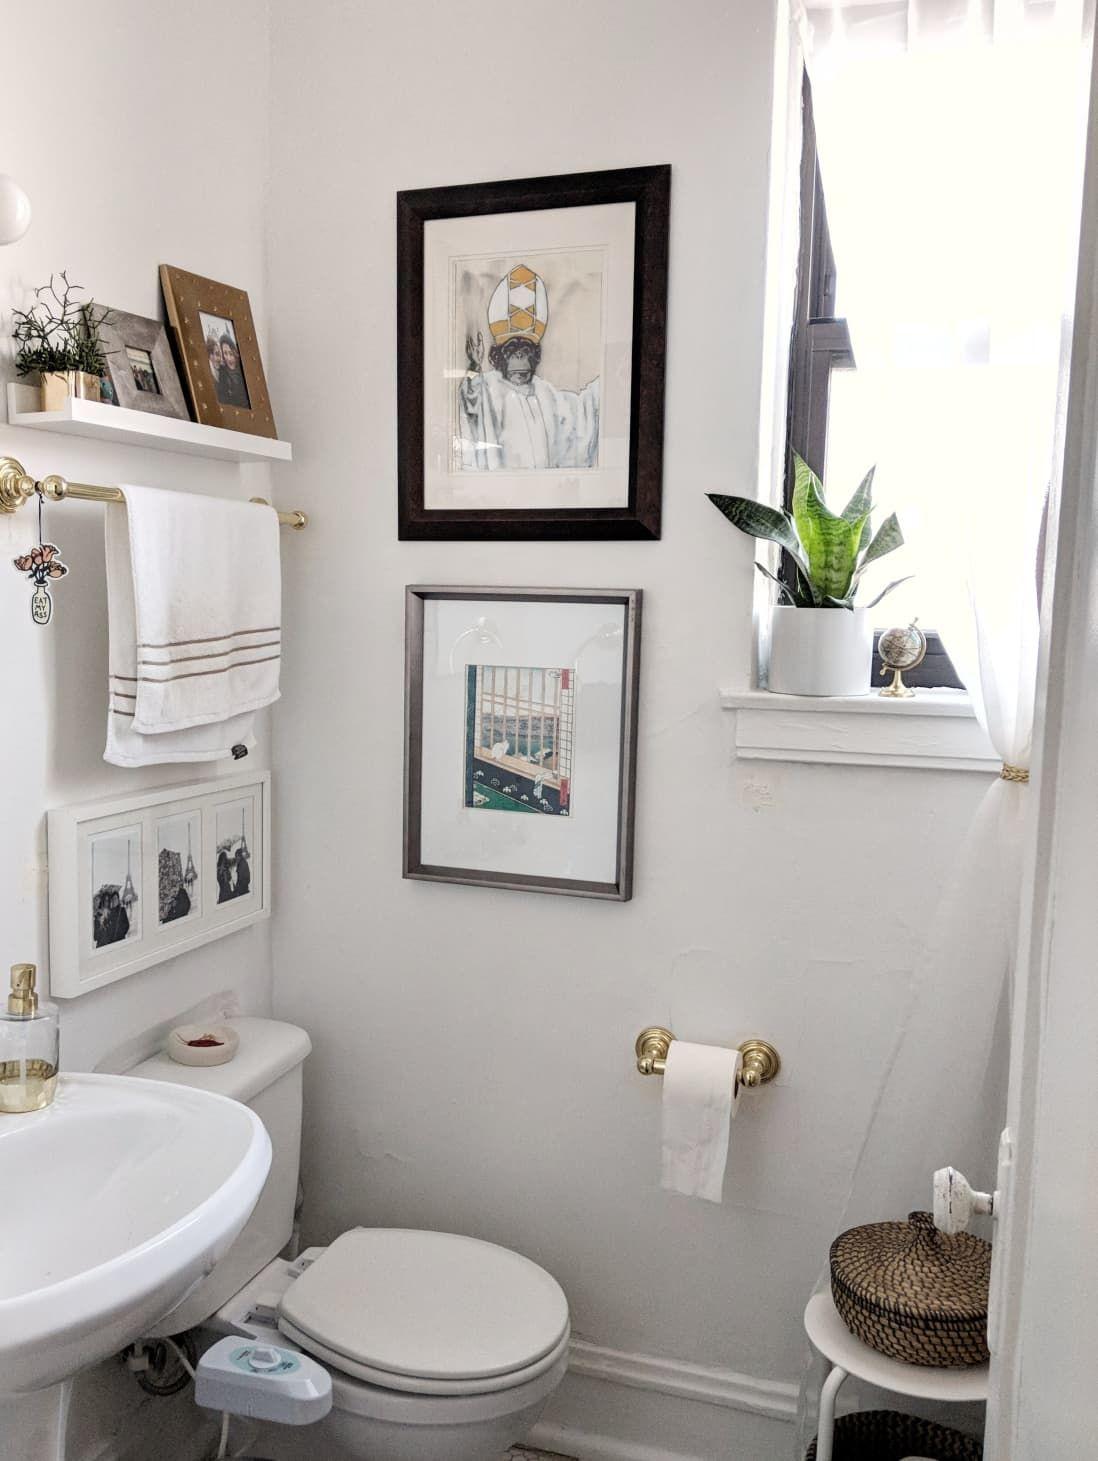 25 Genius Design Storage Ideas For Your Small Bathroom In 2020 Small Apartment Therapy Bathroom Design Small Apartment Therapy Small Spaces